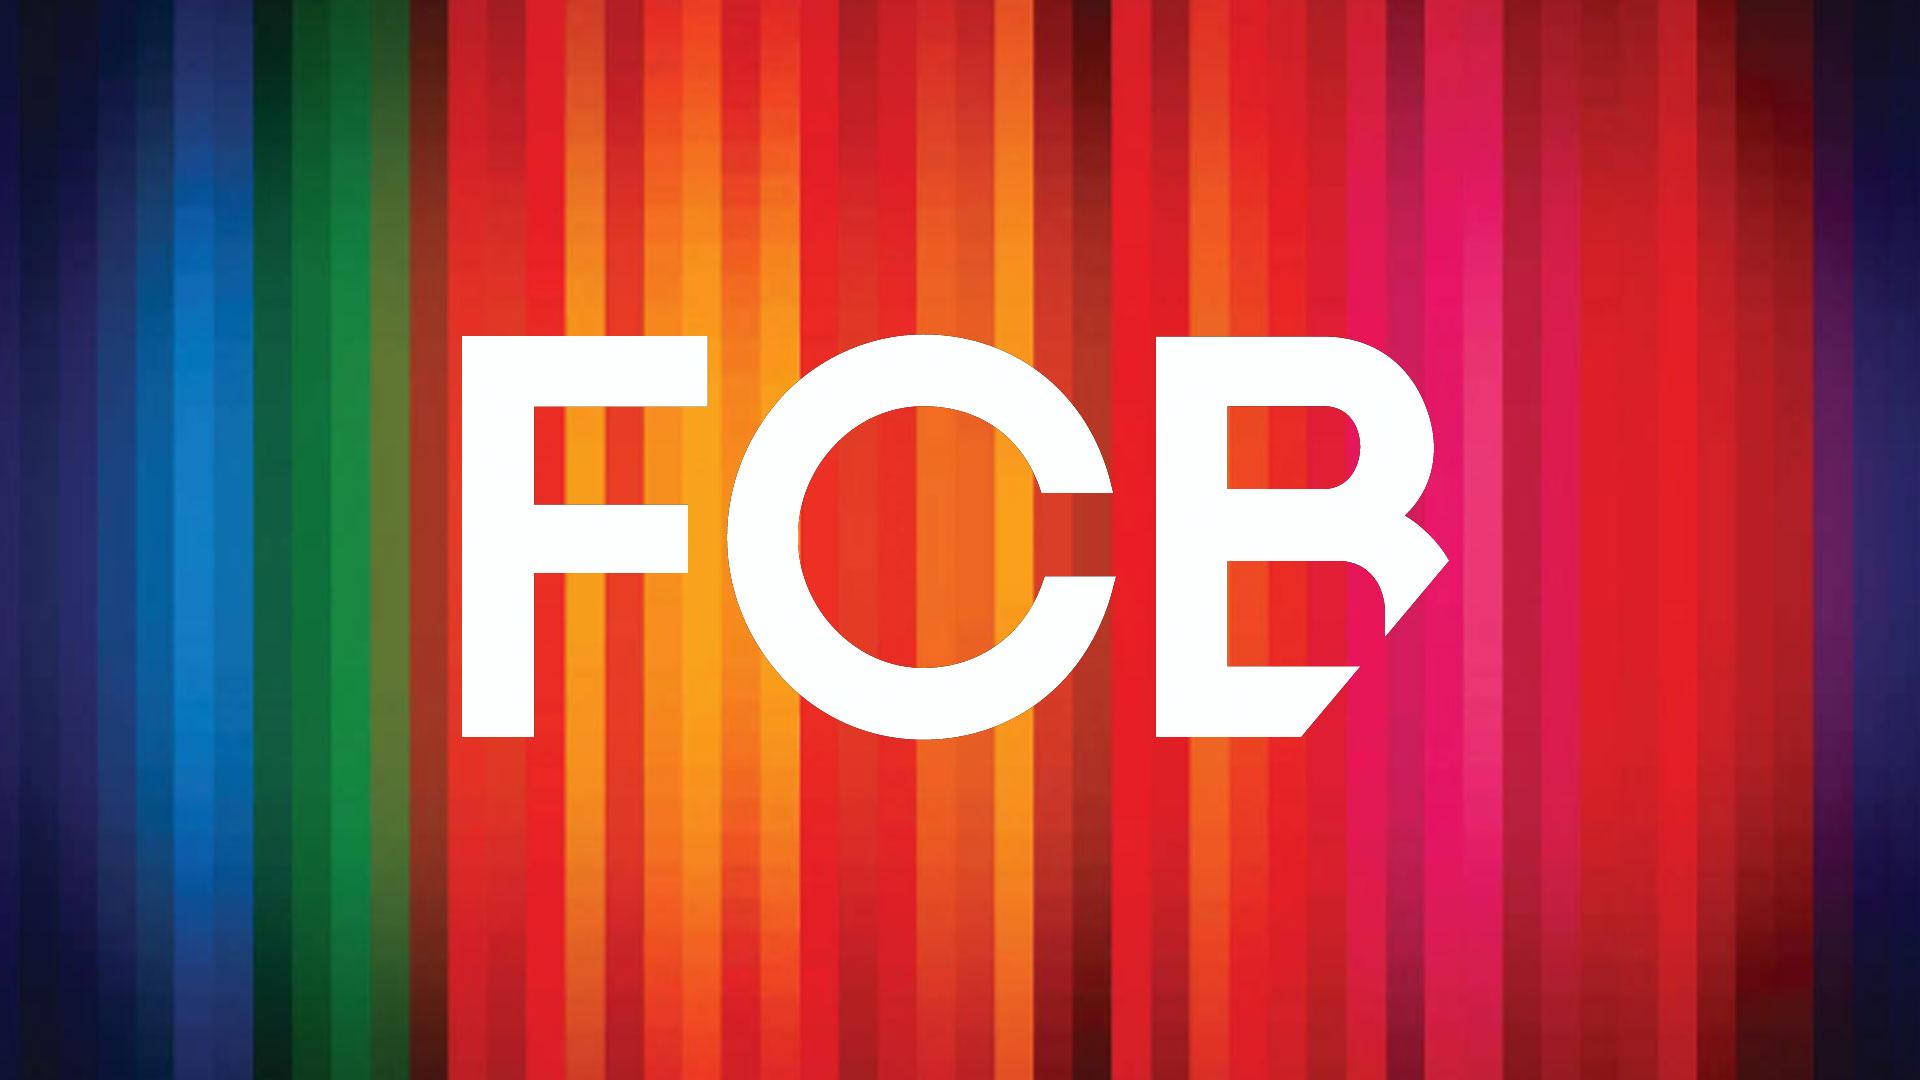 FCB_hero.jpg